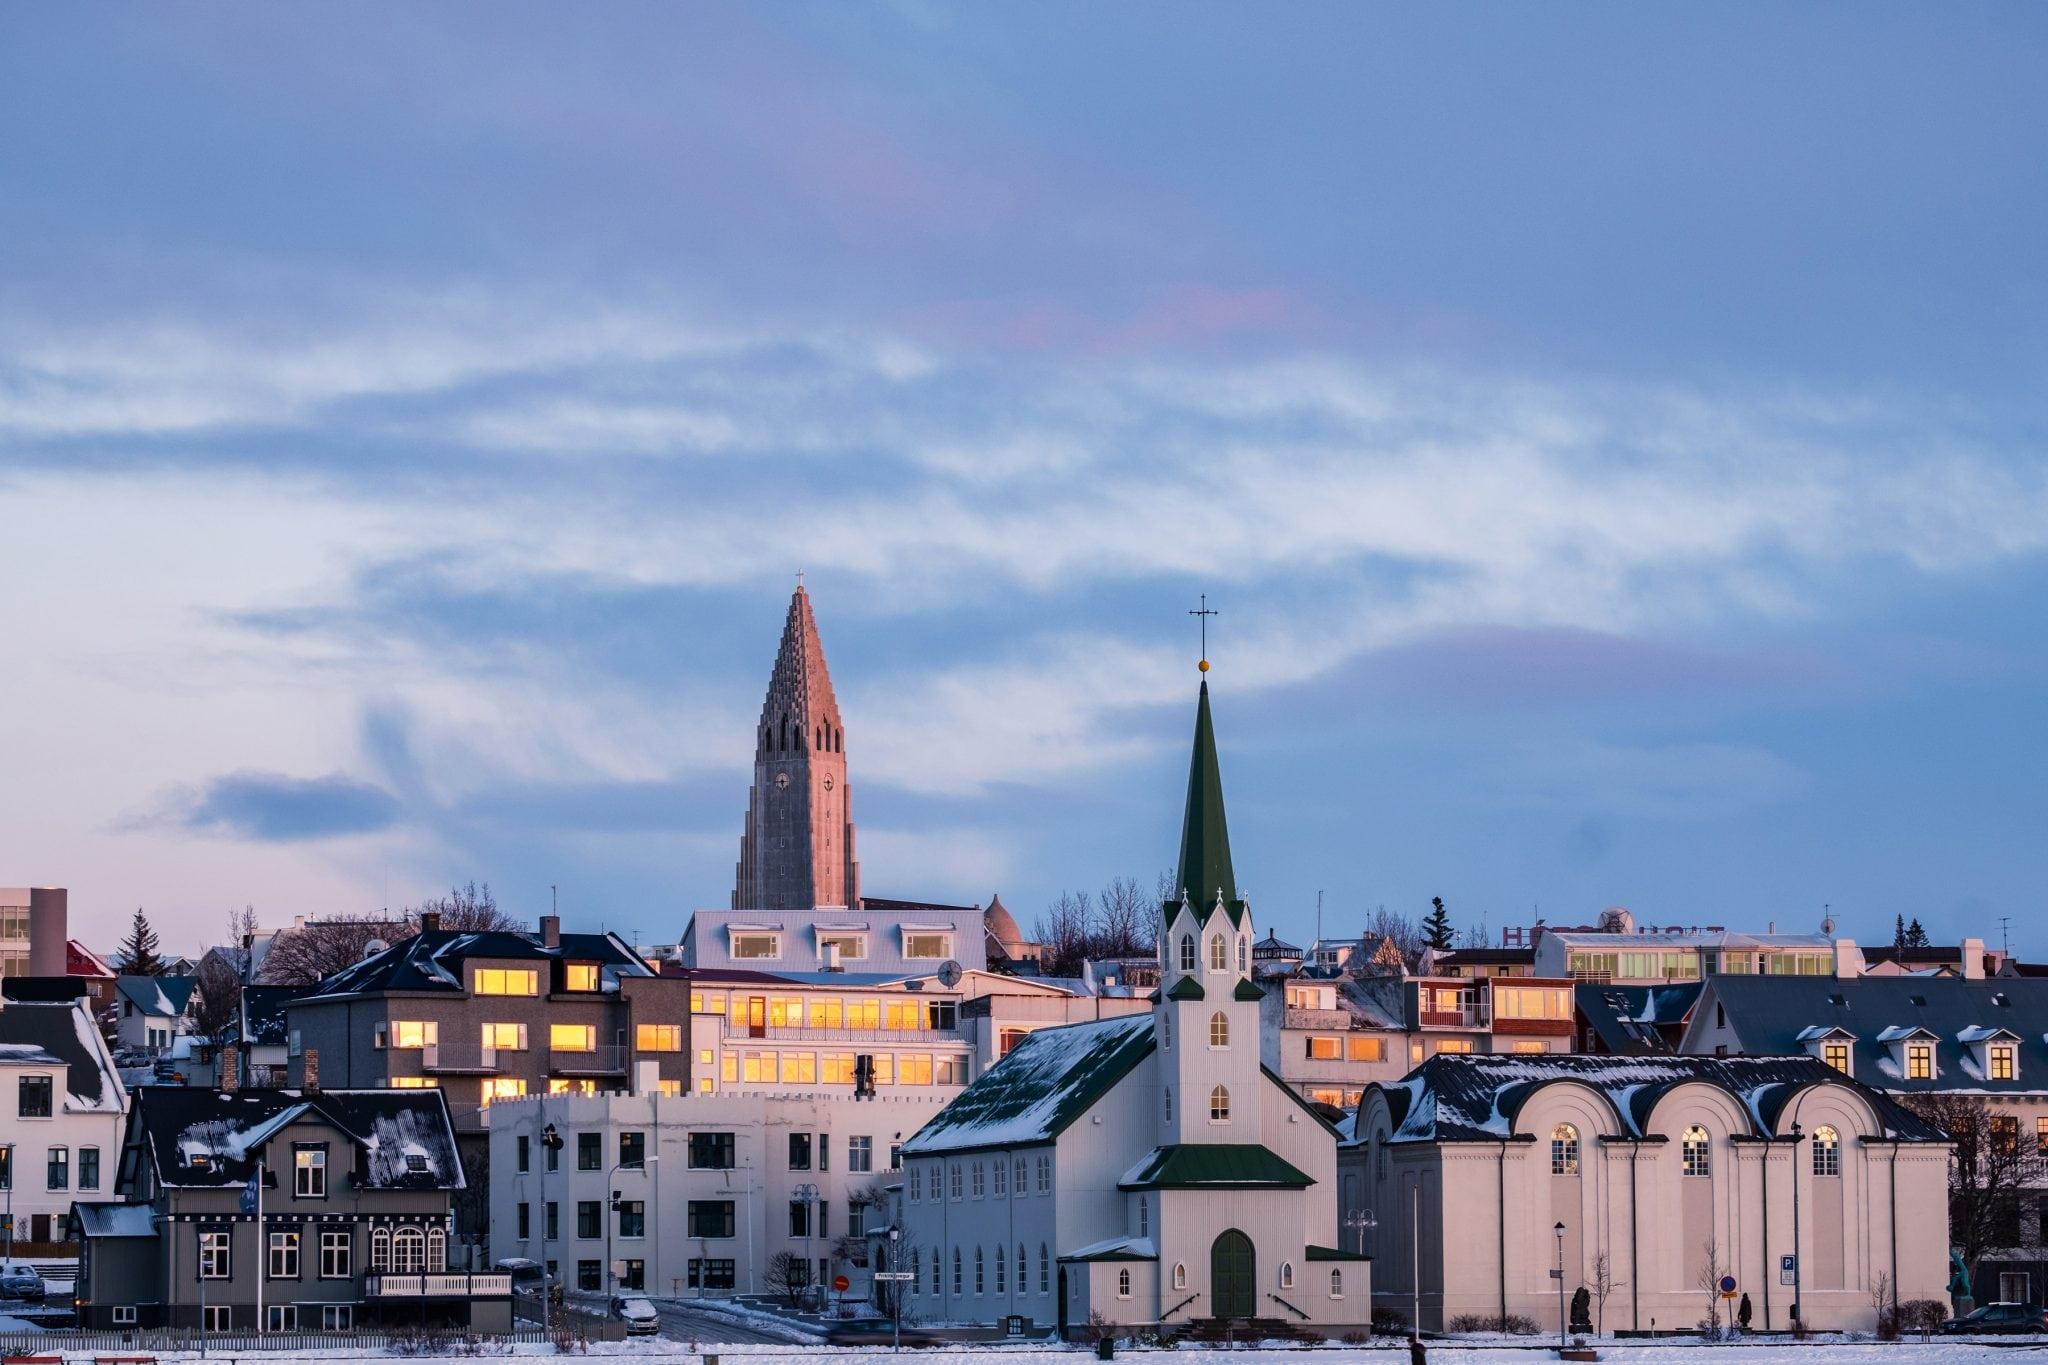 Cityscape of downtown Reykjavik with Hallgrimskirkja in the distance, Reykjavik, Iceland